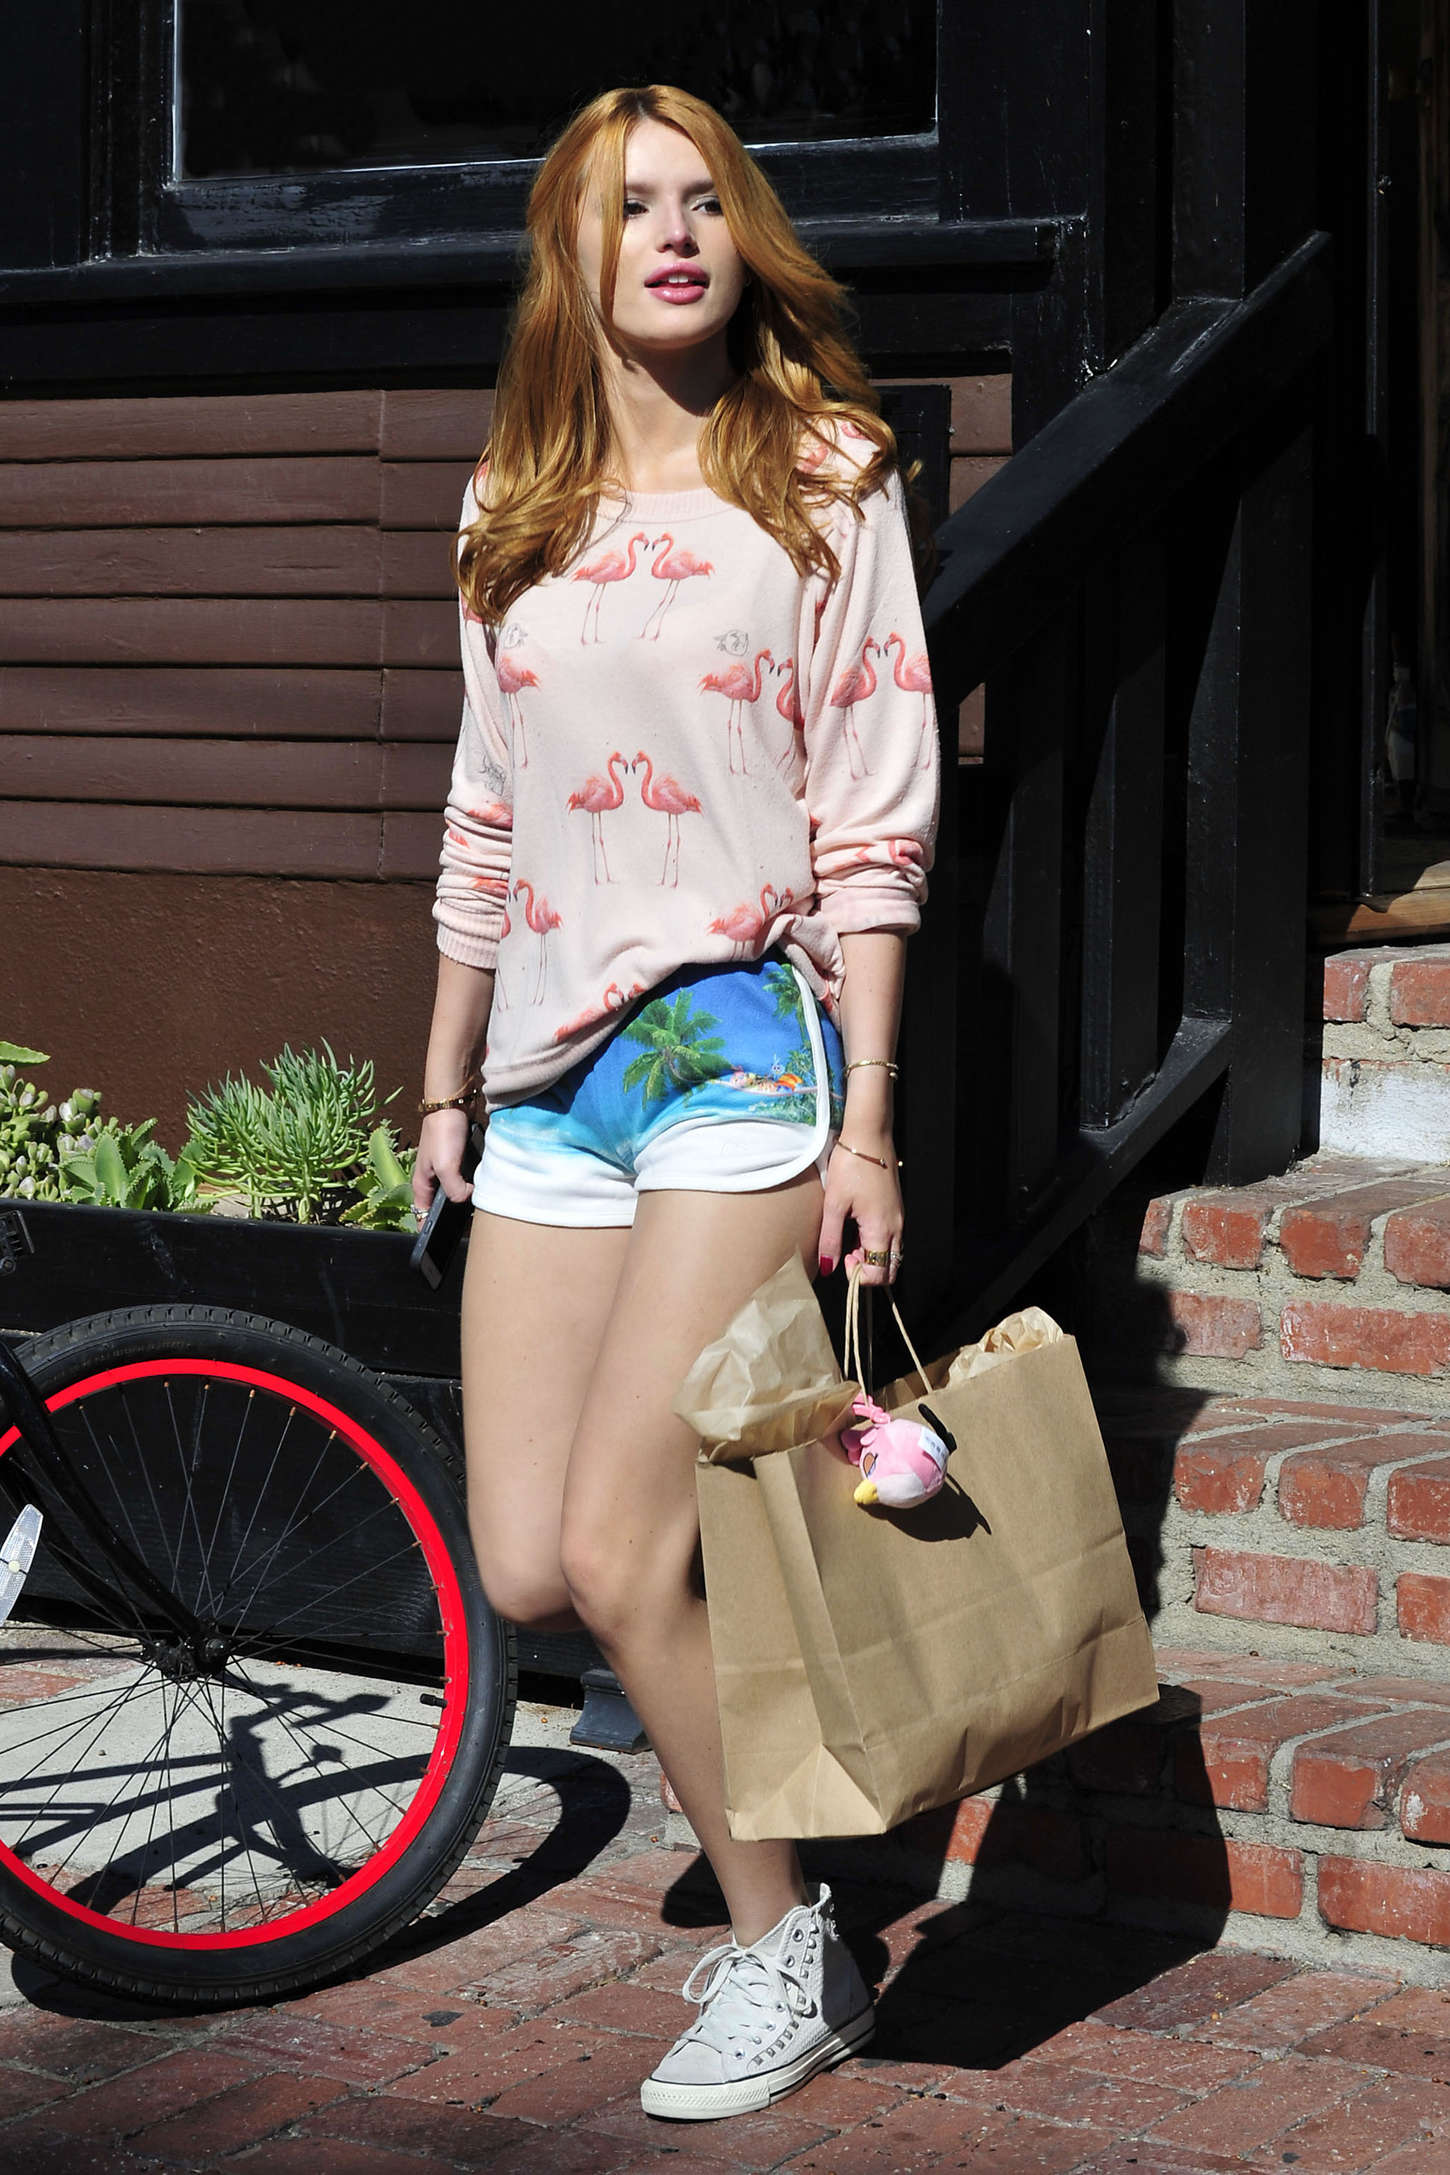 Bella Thorne 2014 : Bella Thorne: Michael Simon Photoshoot 2014 -28